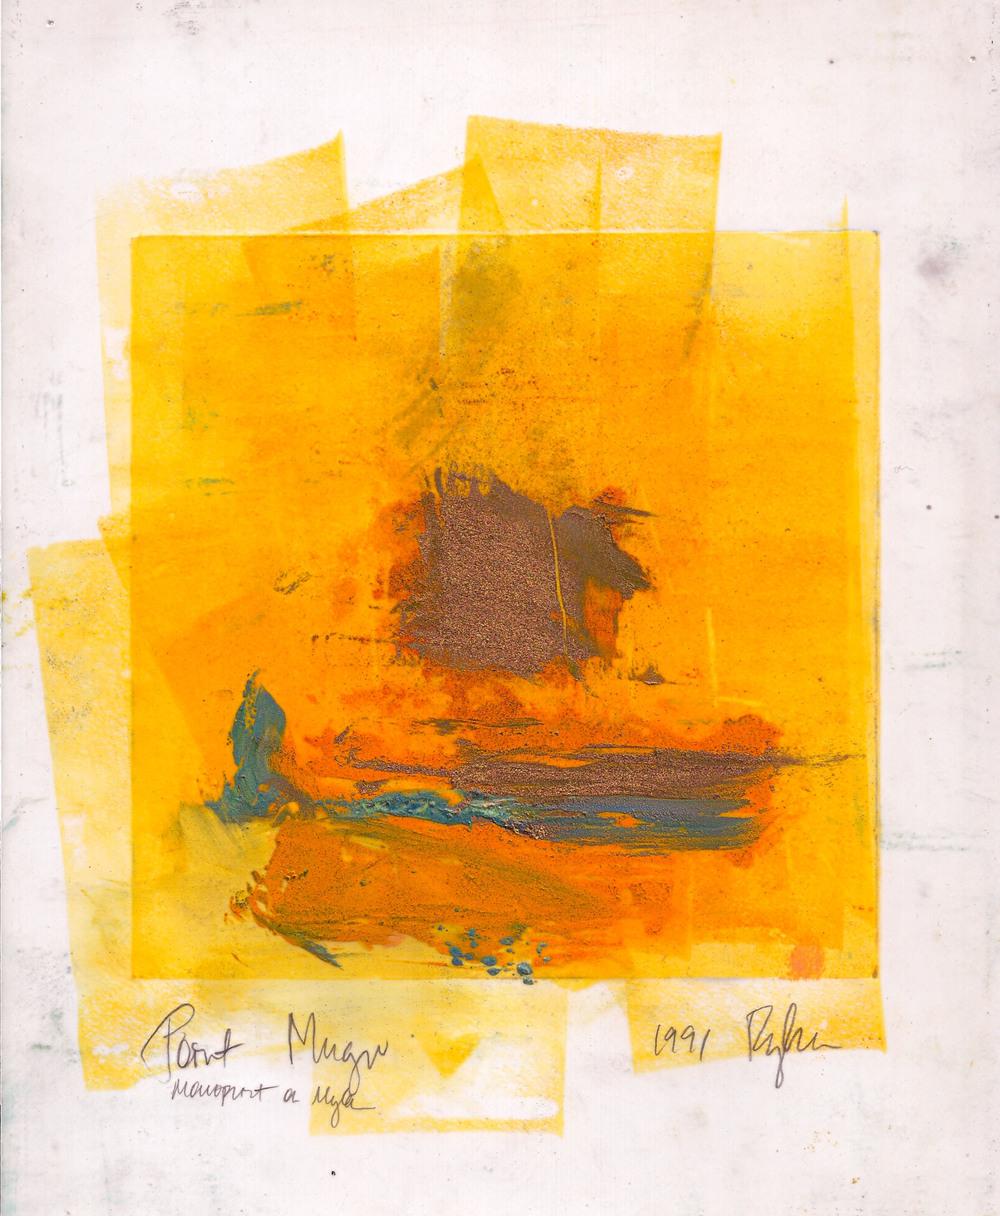 """Point Mugu"" monoprint, 1990"